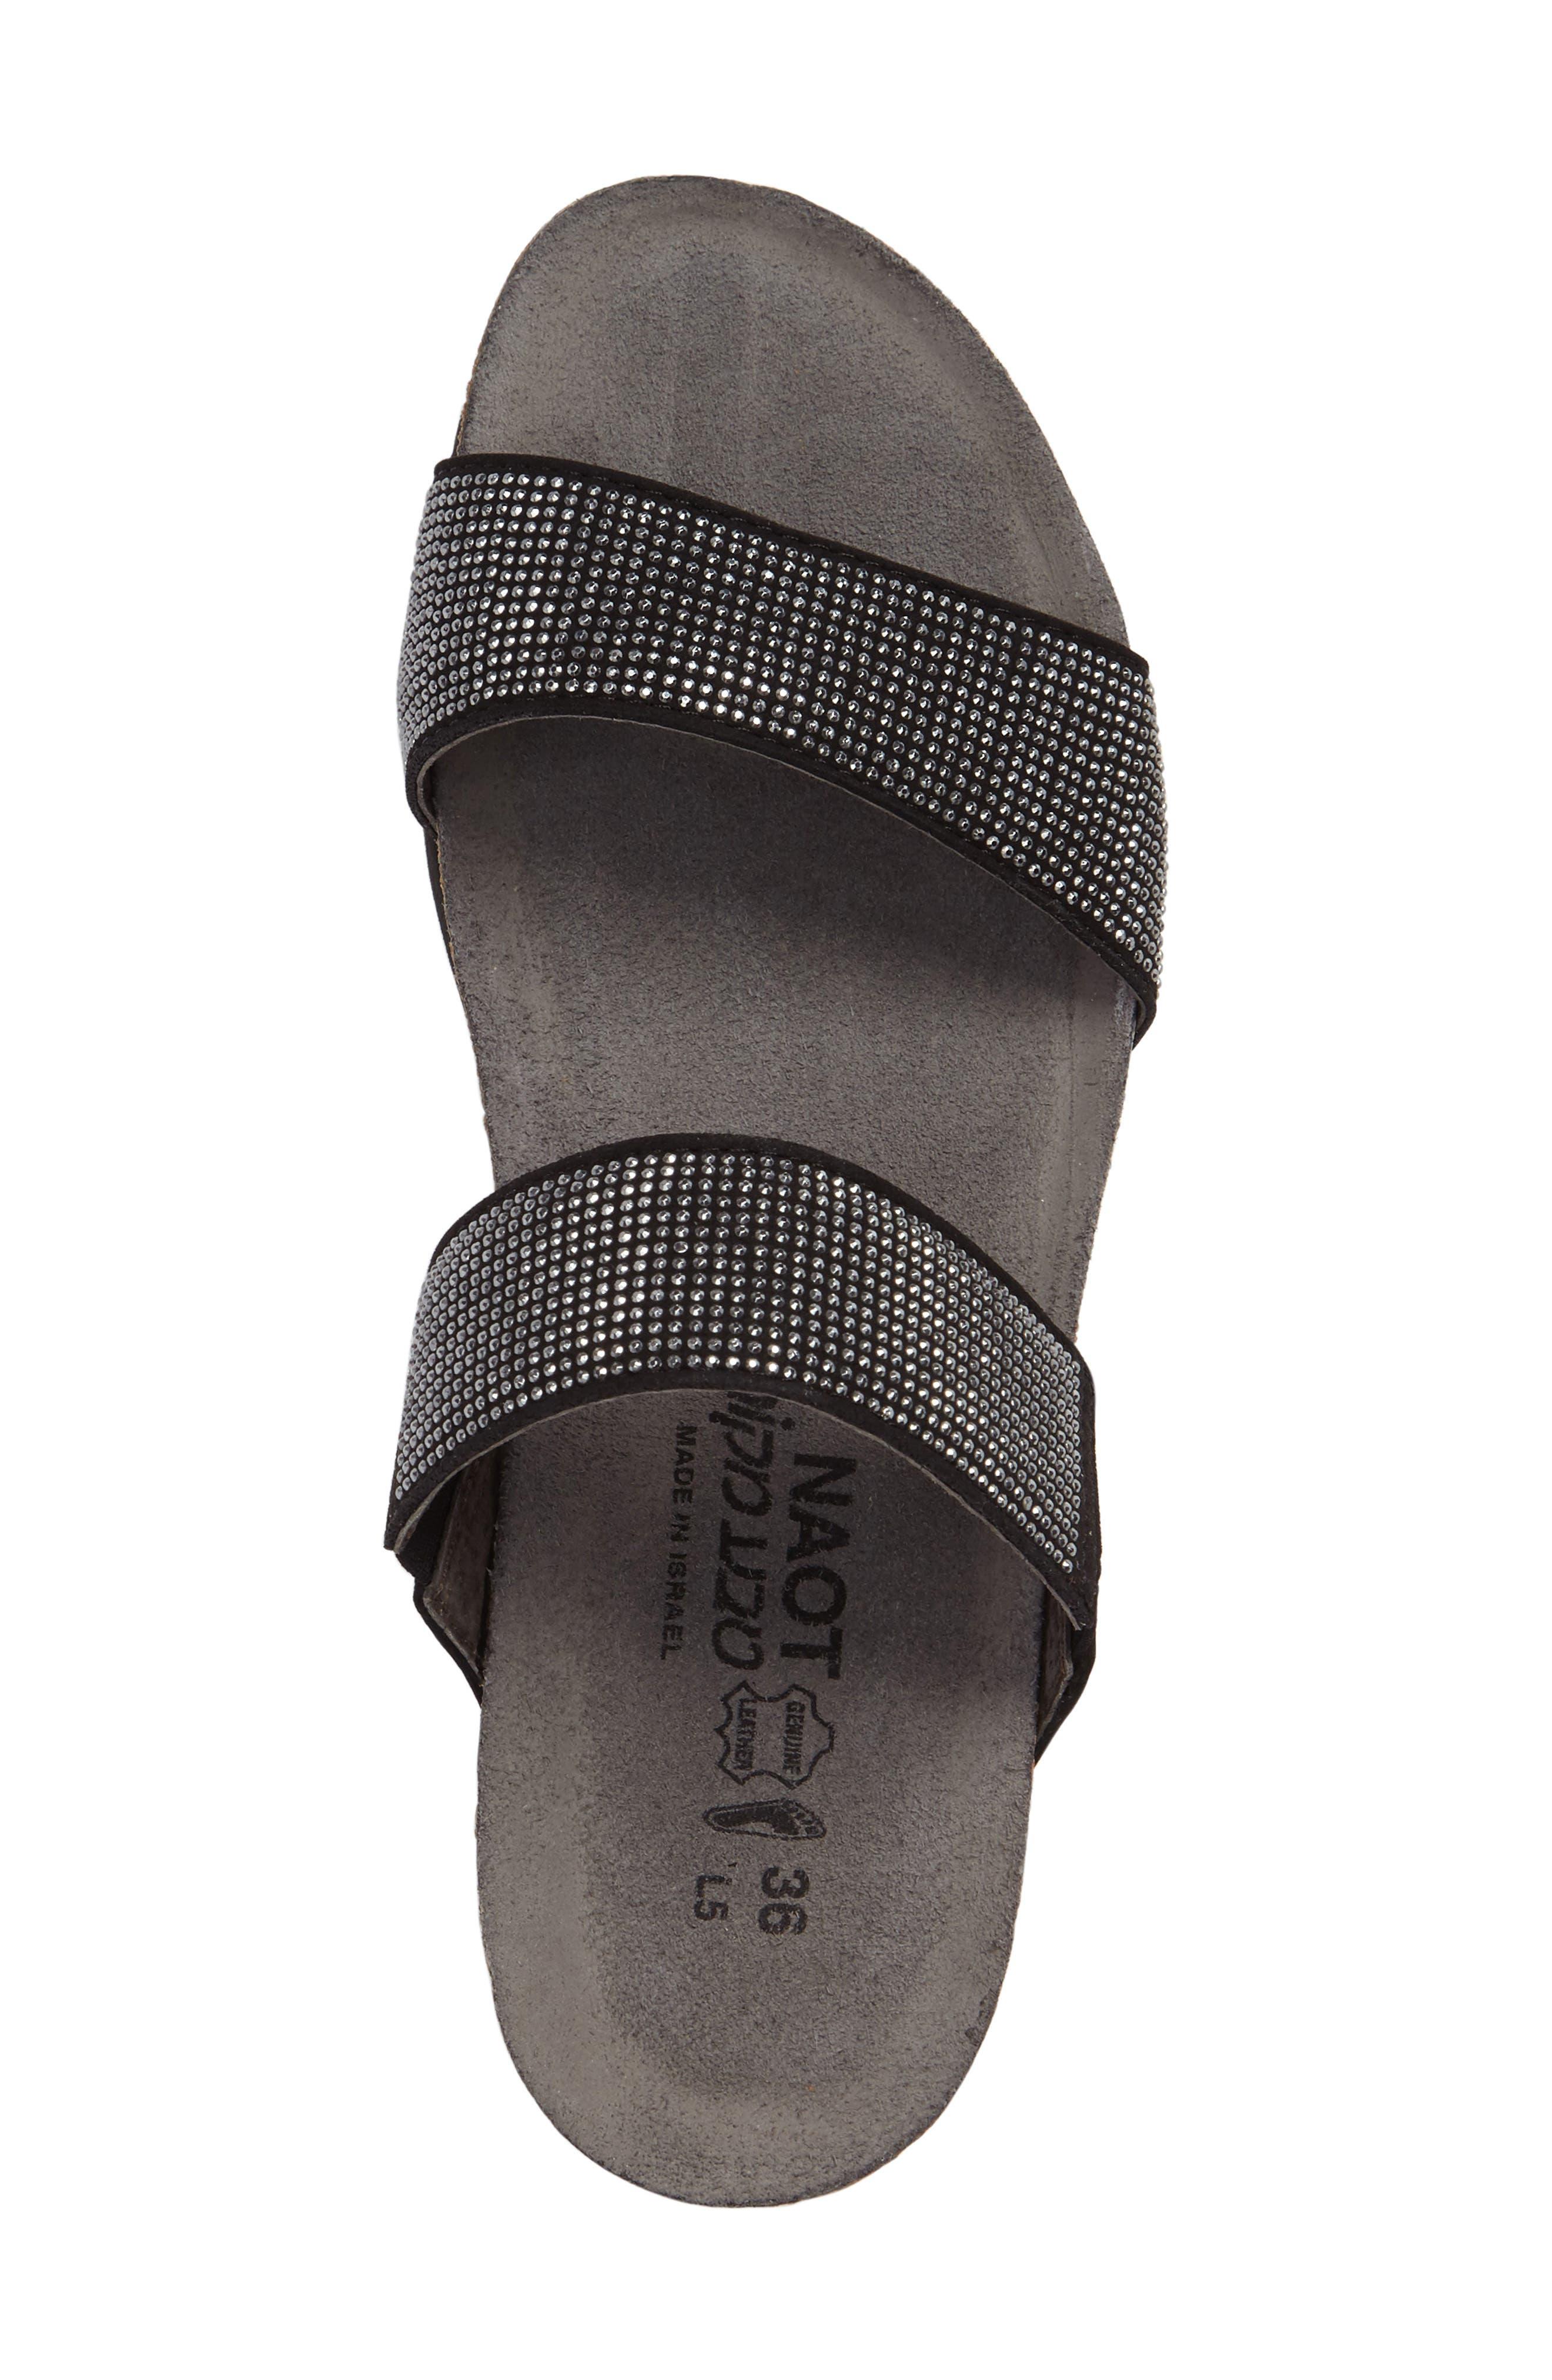 'Bianca' Slide Sandal,                             Alternate thumbnail 3, color,                             BLACK LEATHER